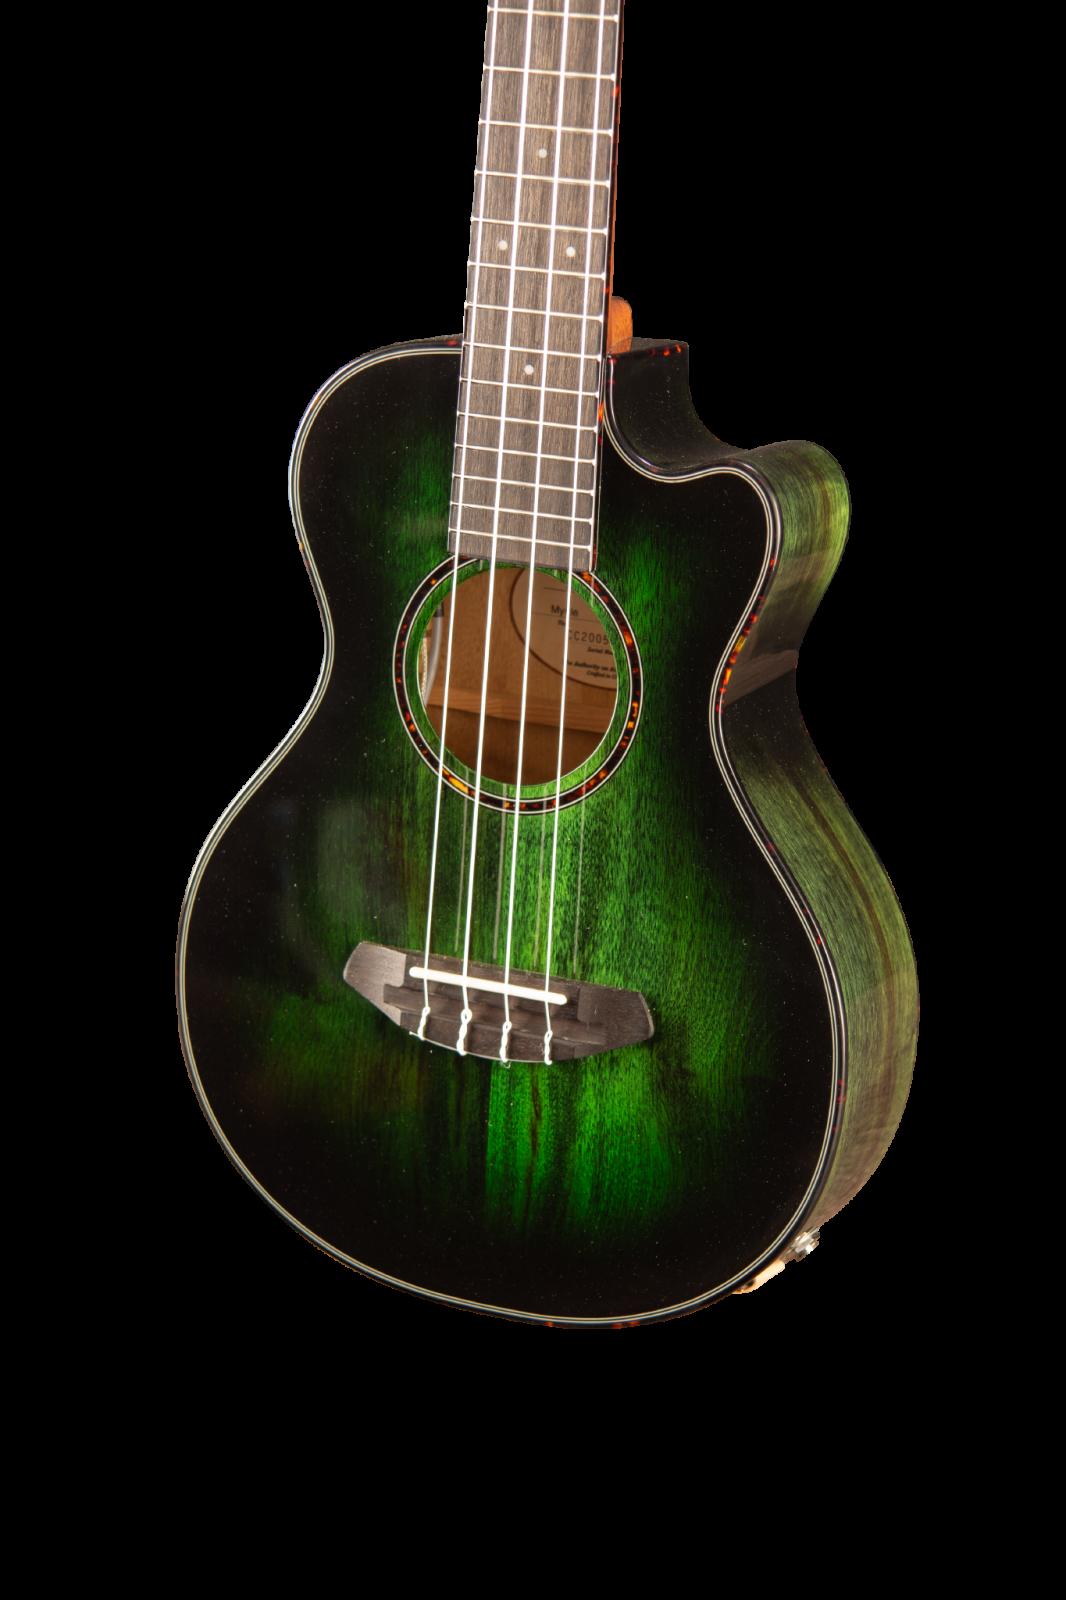 Breedlove Lu'au Tenor Ukulele Acoustic Electric Uke LTD Emerald Gloss